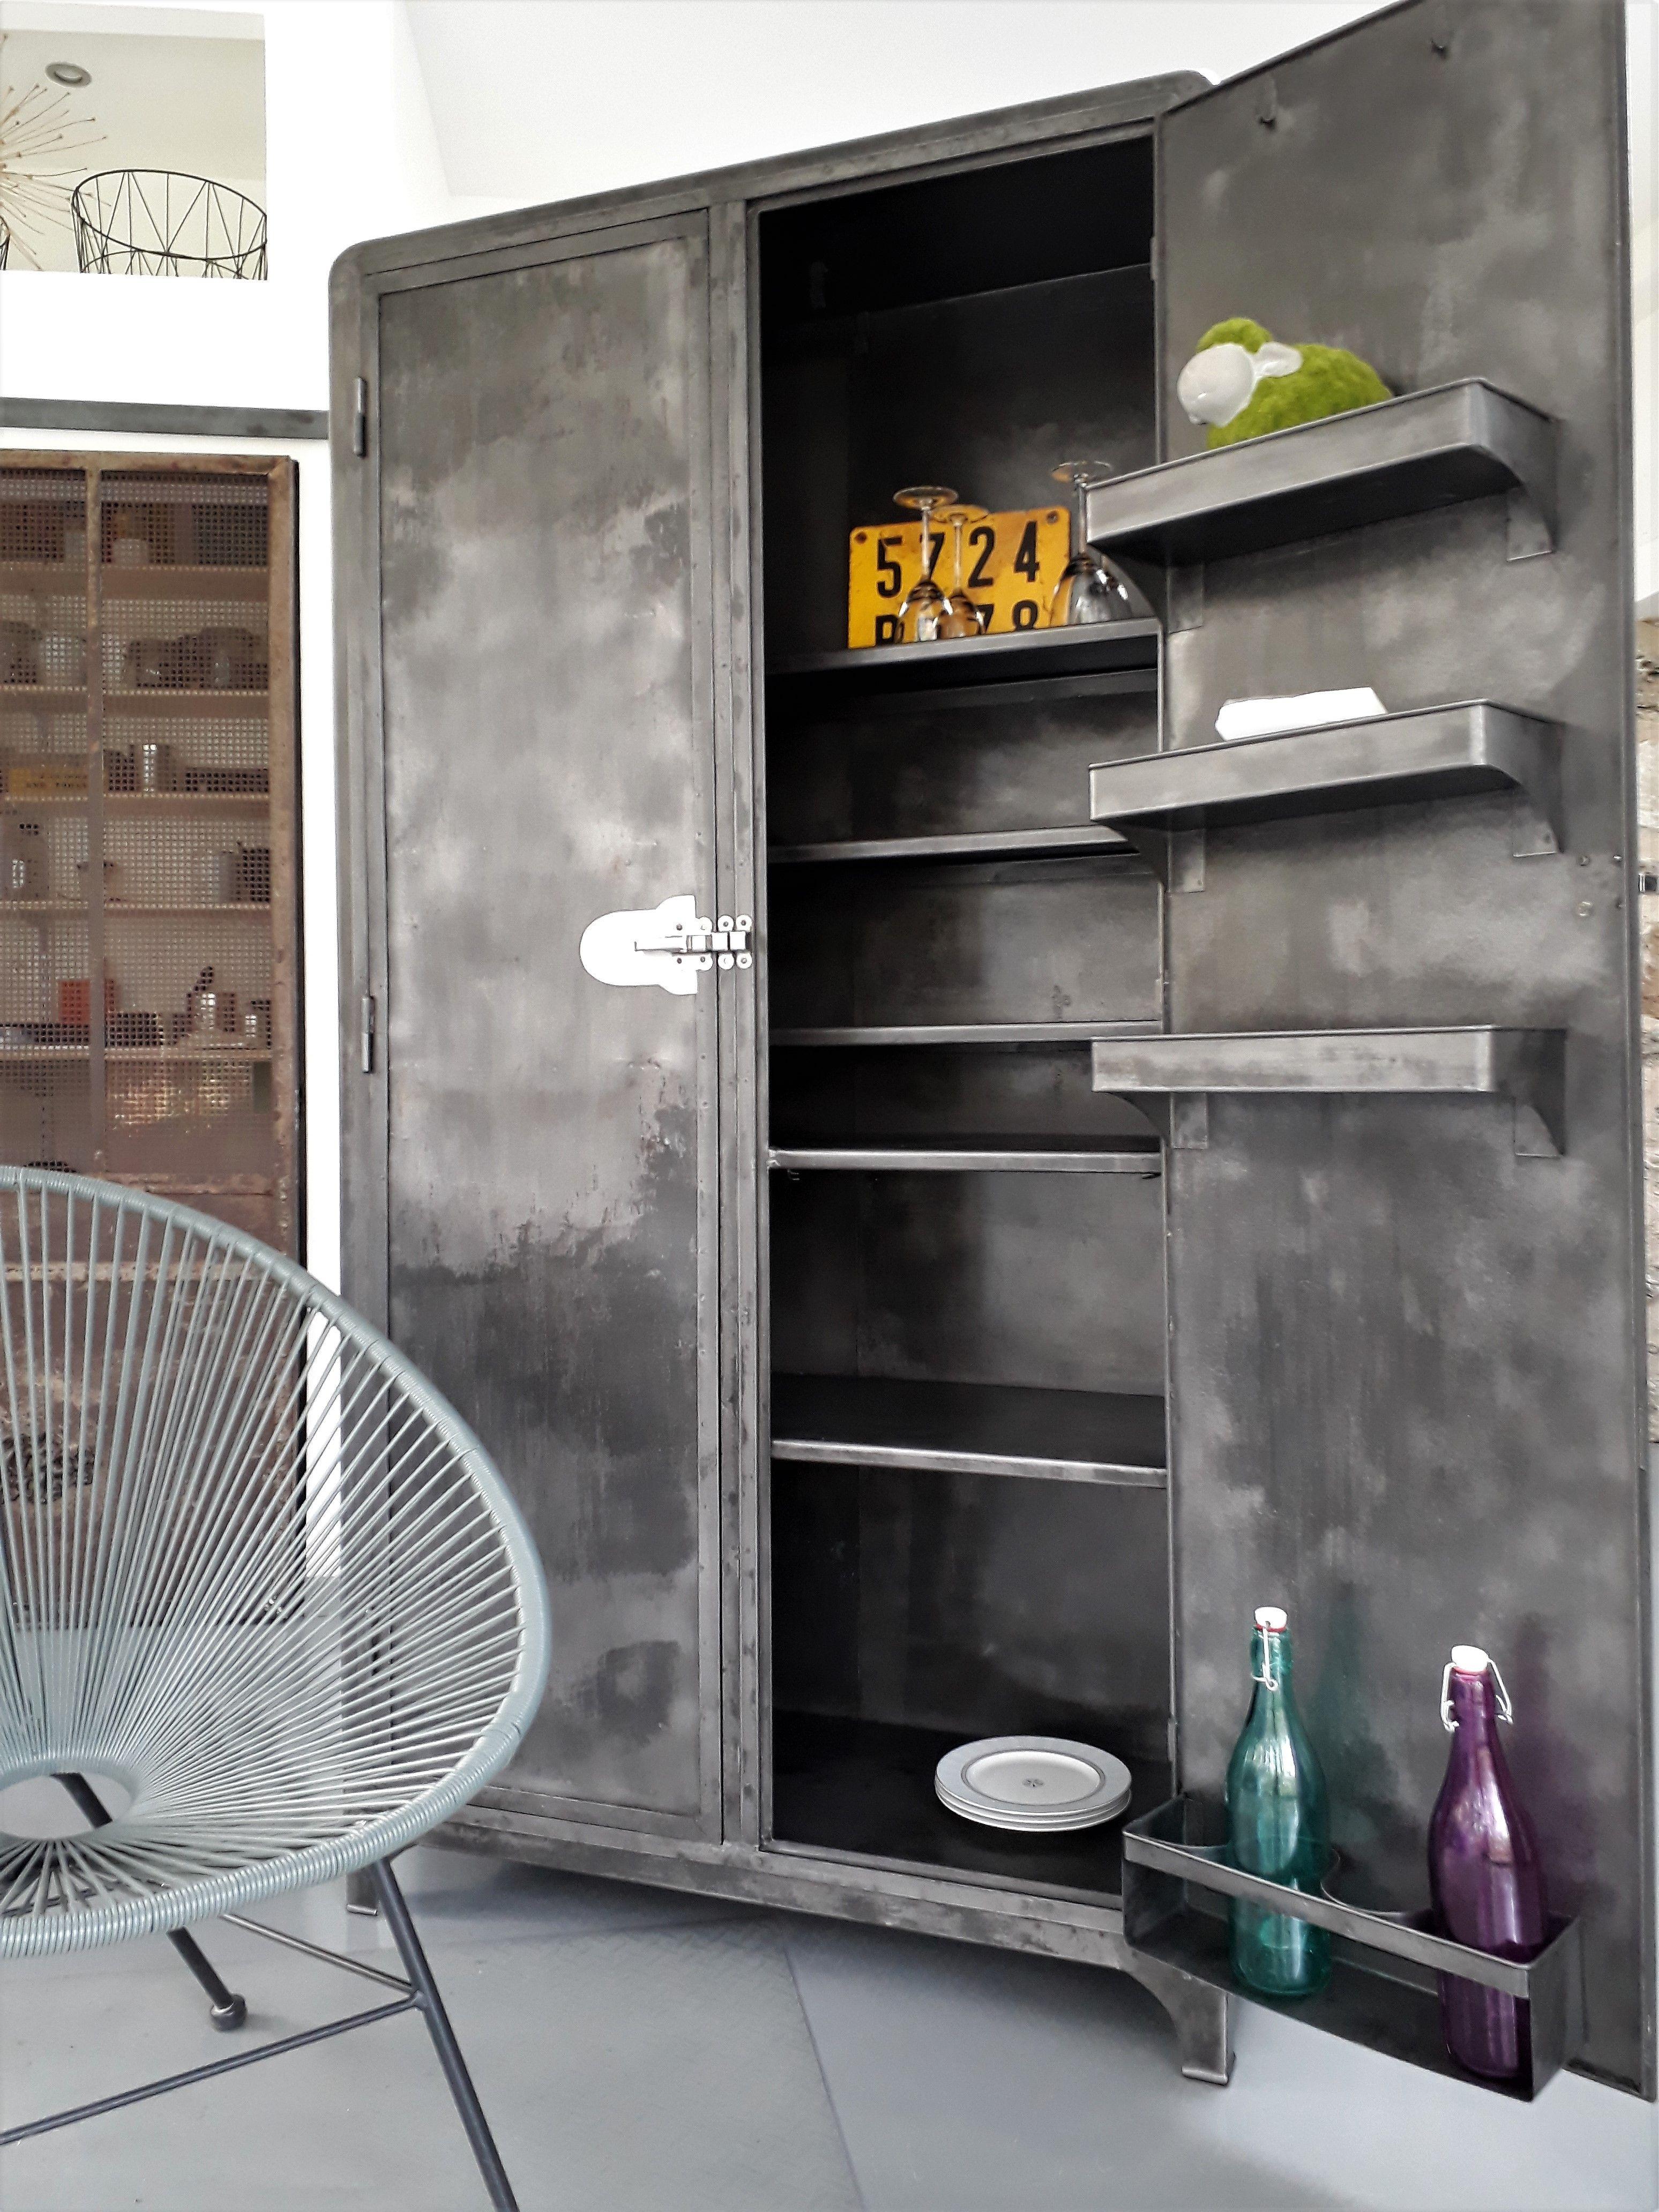 meuble industriel armoire m tal vintage inspirationrecup. Black Bedroom Furniture Sets. Home Design Ideas